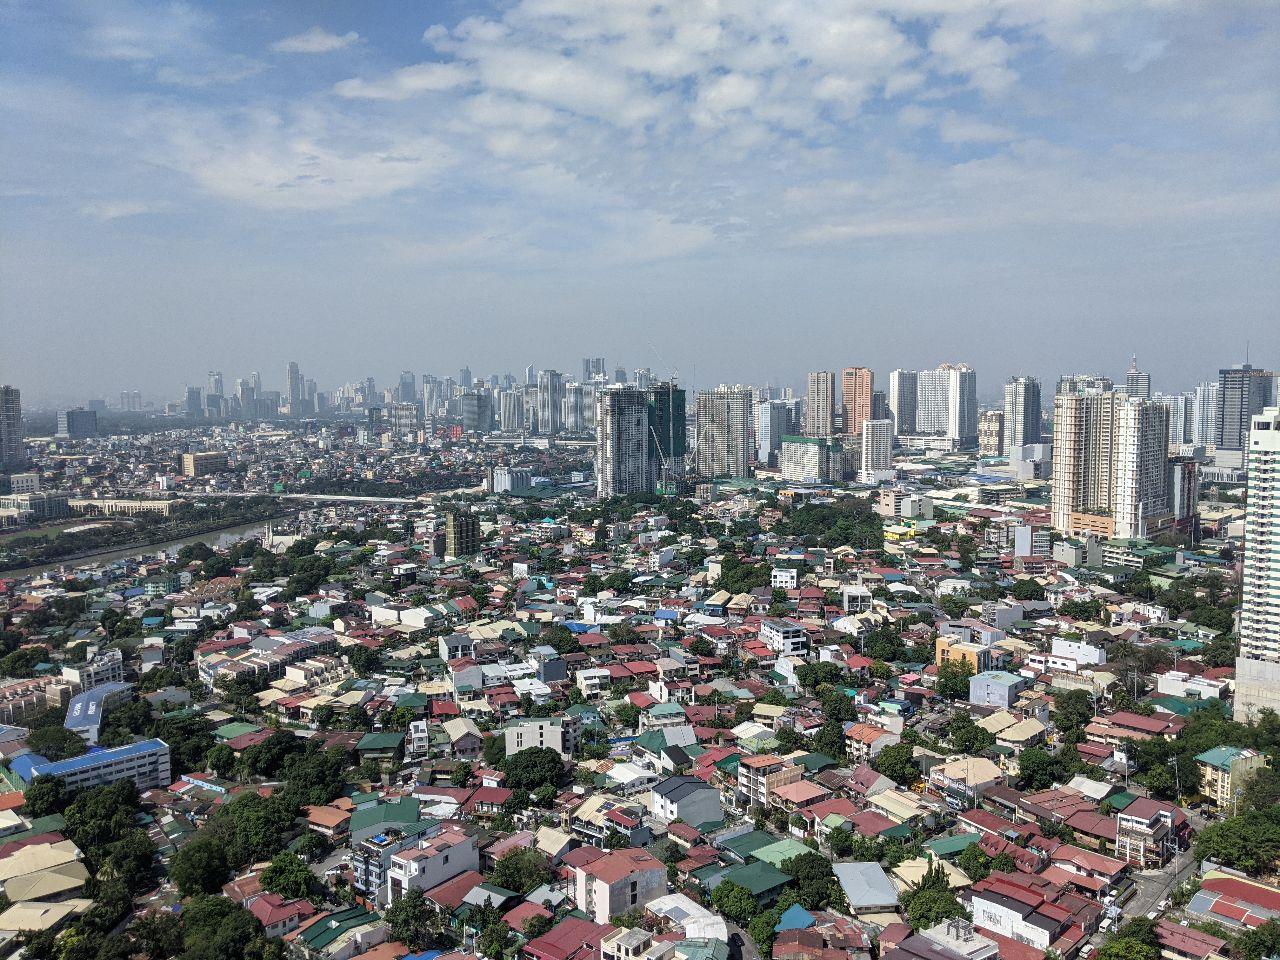 An aerial view of Metro Manila (Pasig City, Mandaluyong and Makati)